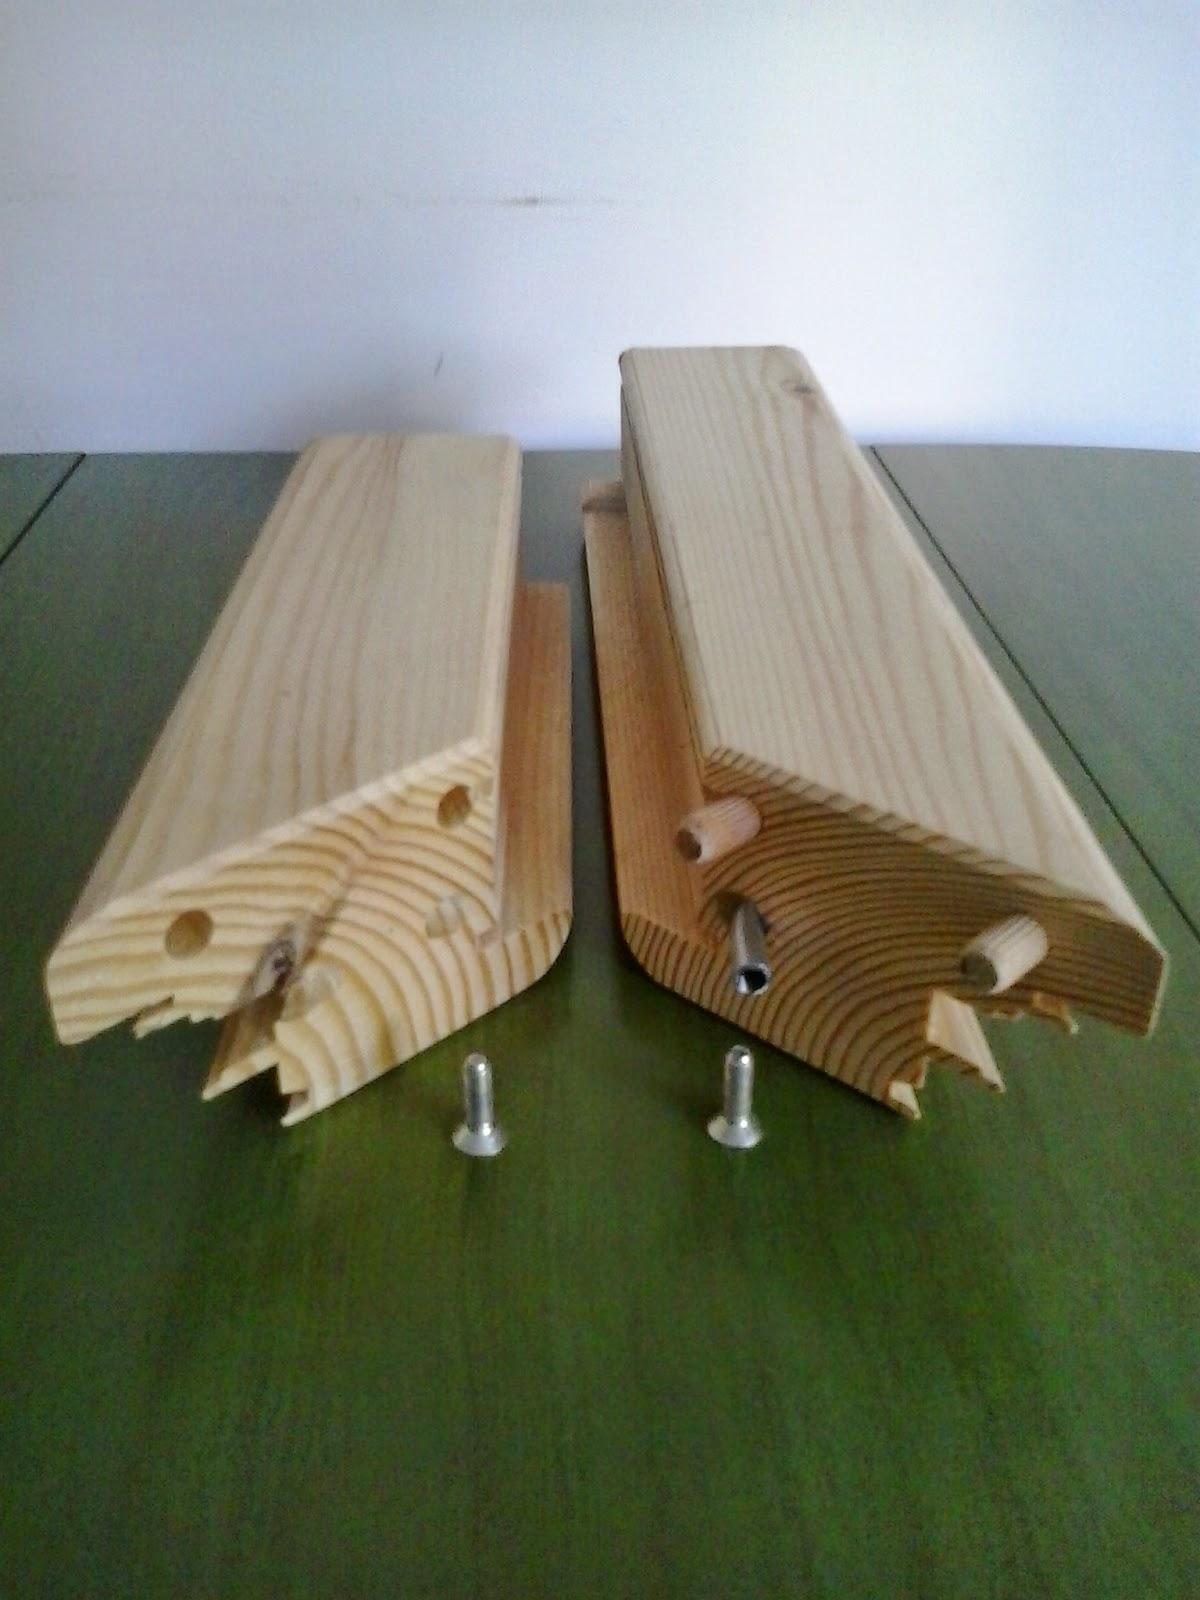 artigianato fai da te made in italy legno metalli e